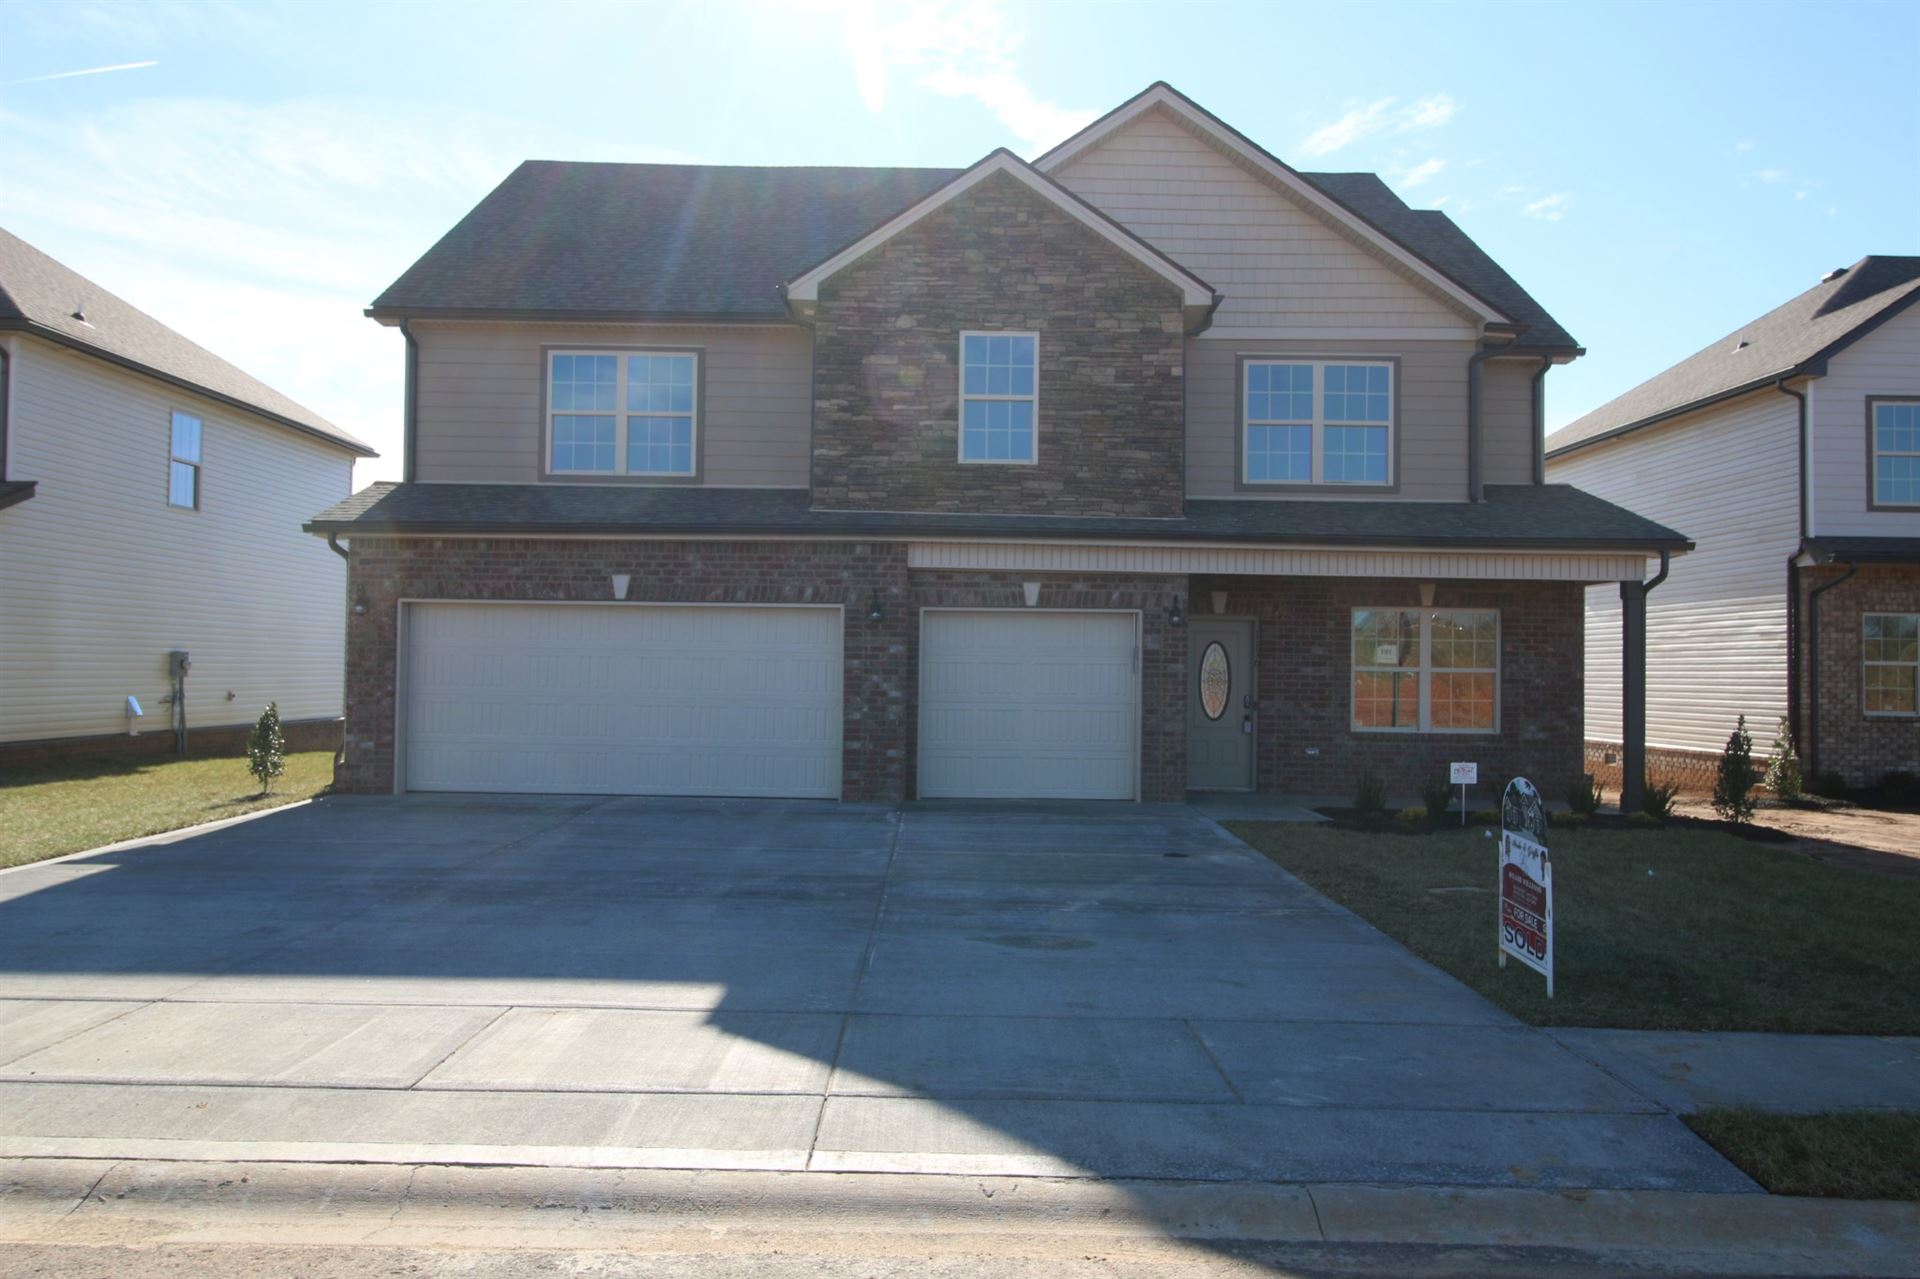 197 Charleston Oaks Reserves, Clarksville, TN 37042 - MLS#: 2290715